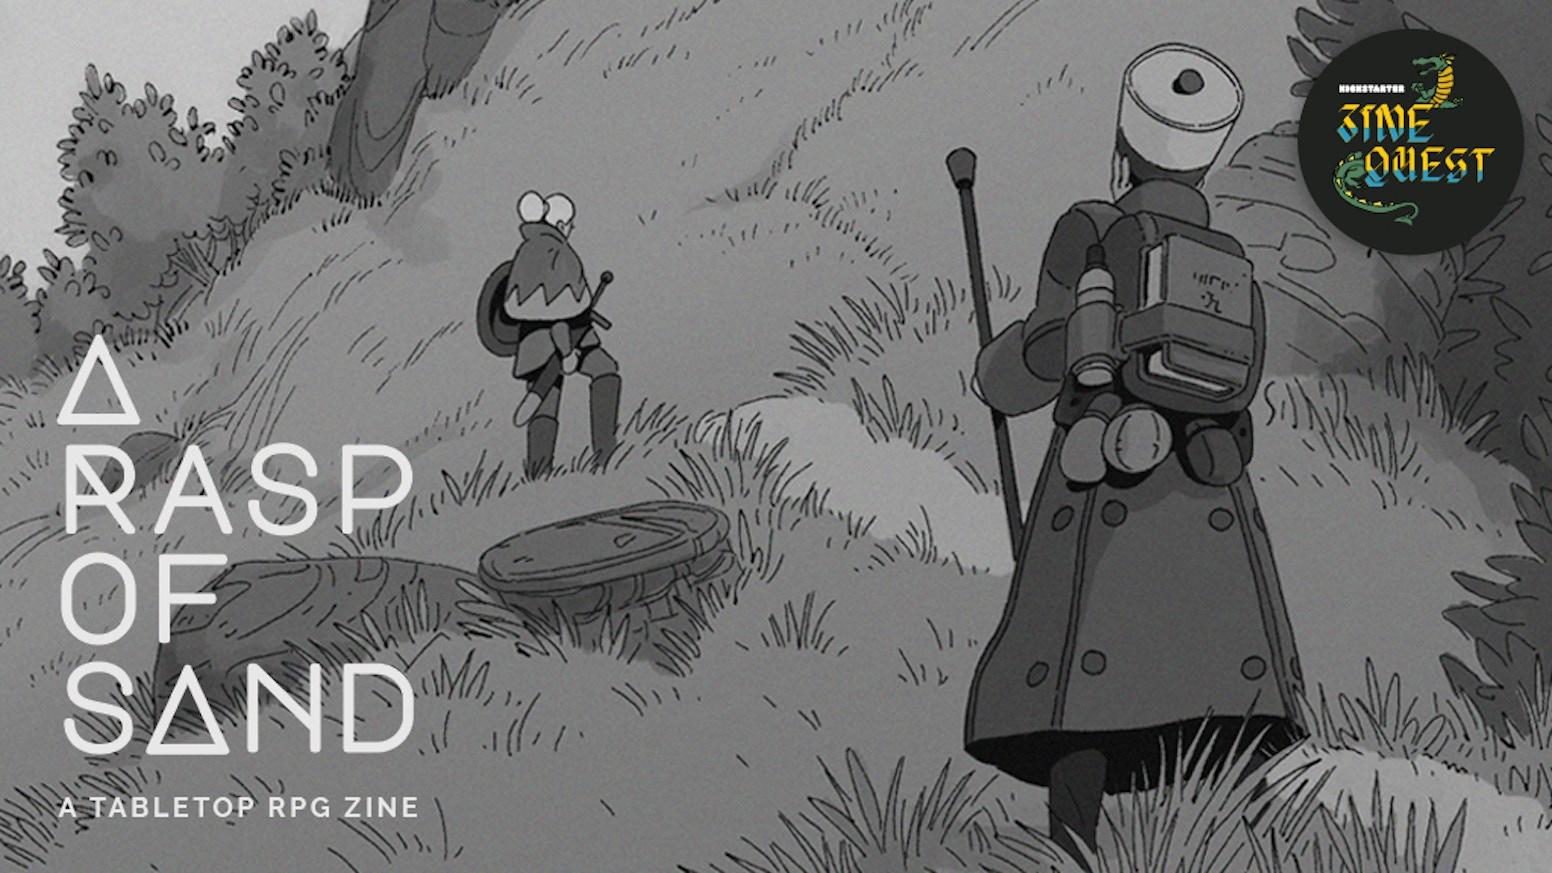 A Rasp of Sand: A Roguelike Tabletop RPG Experience by David Cox — Kickstarter